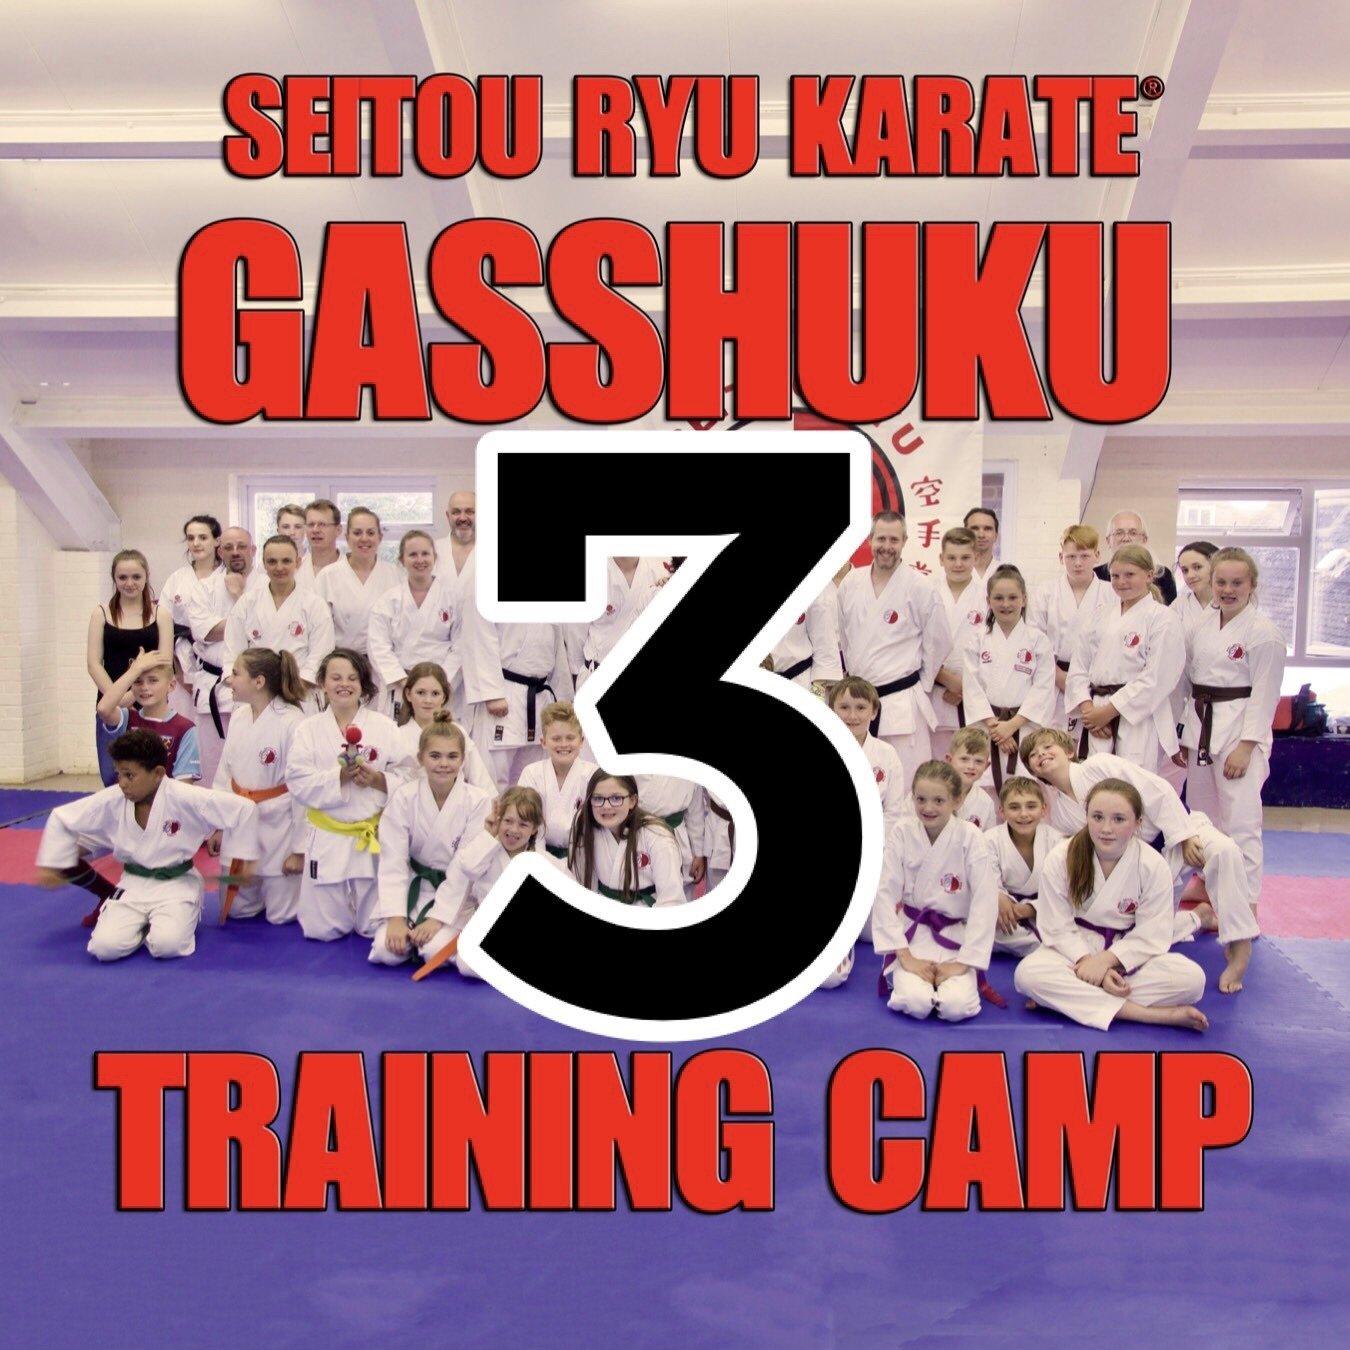 Gasshuku Winter Camp (3 Days)